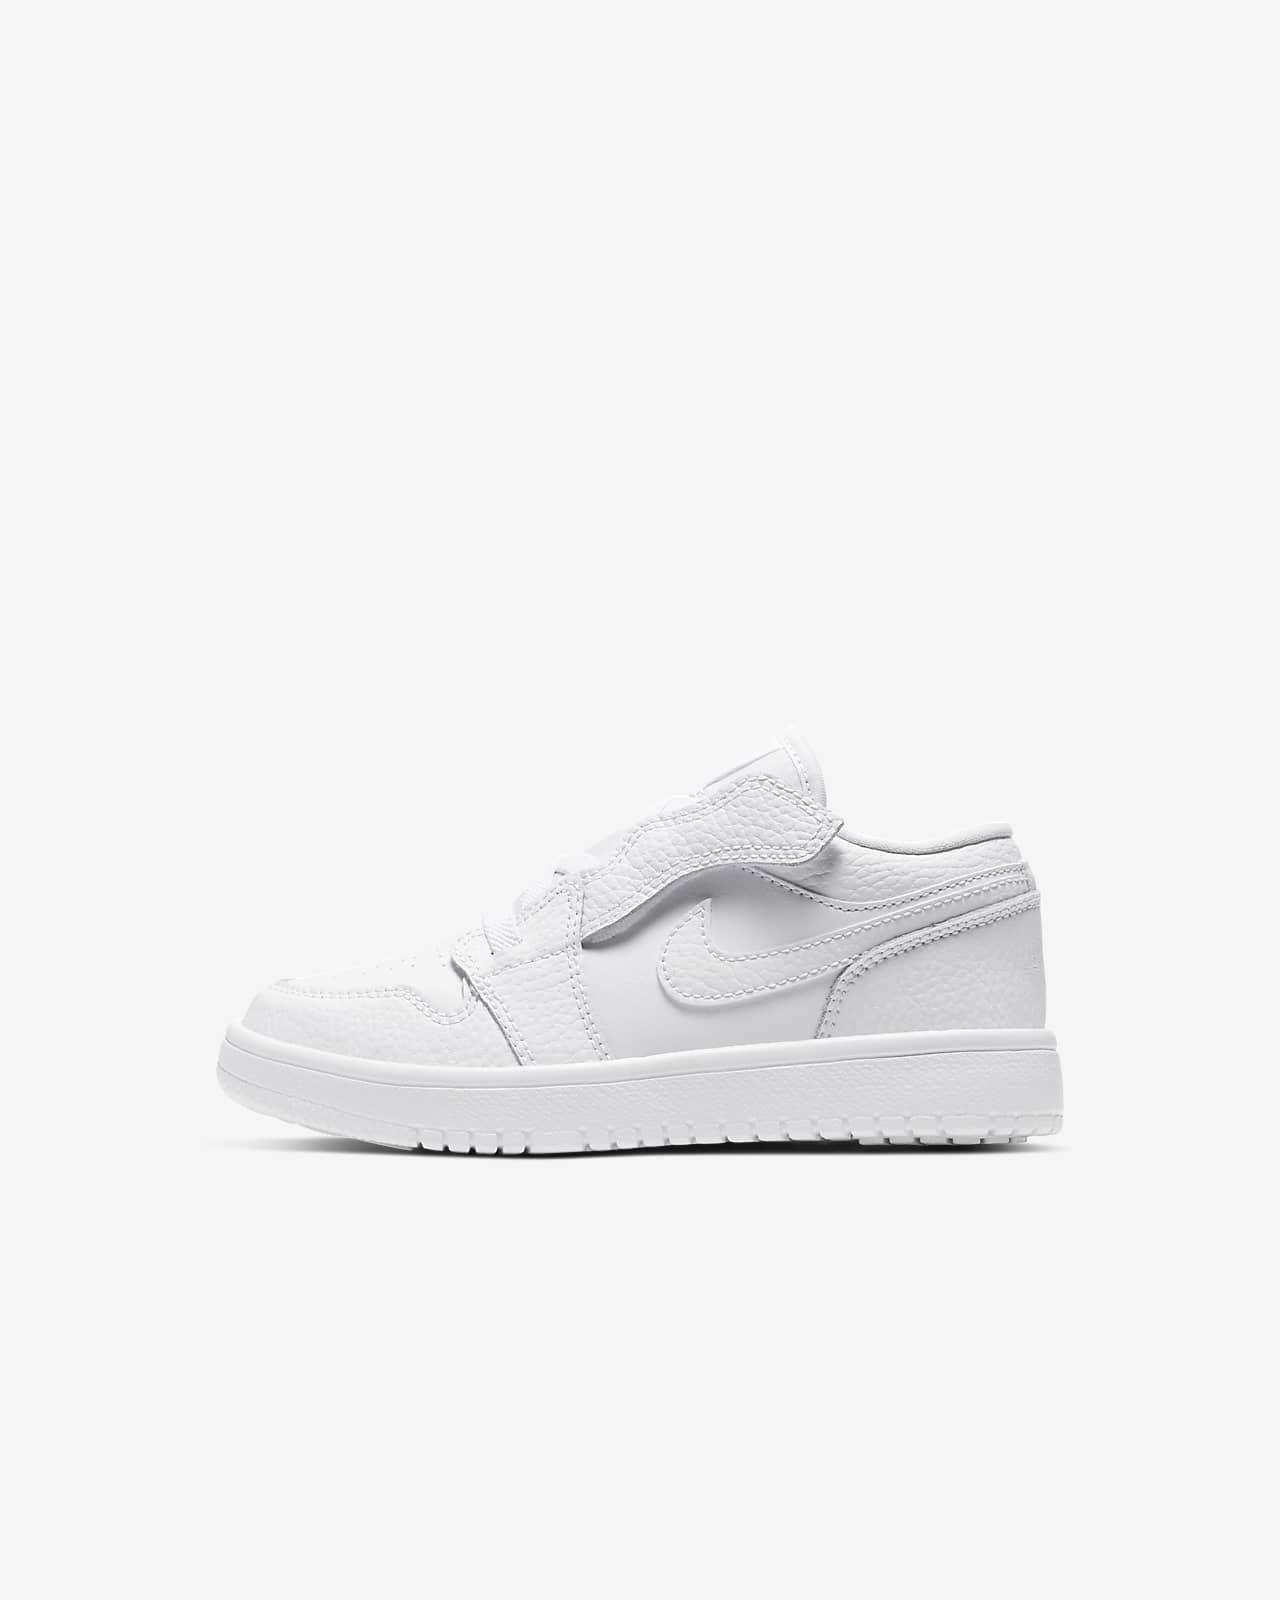 Jordan 1 Low Alt Younger Kids' Shoe